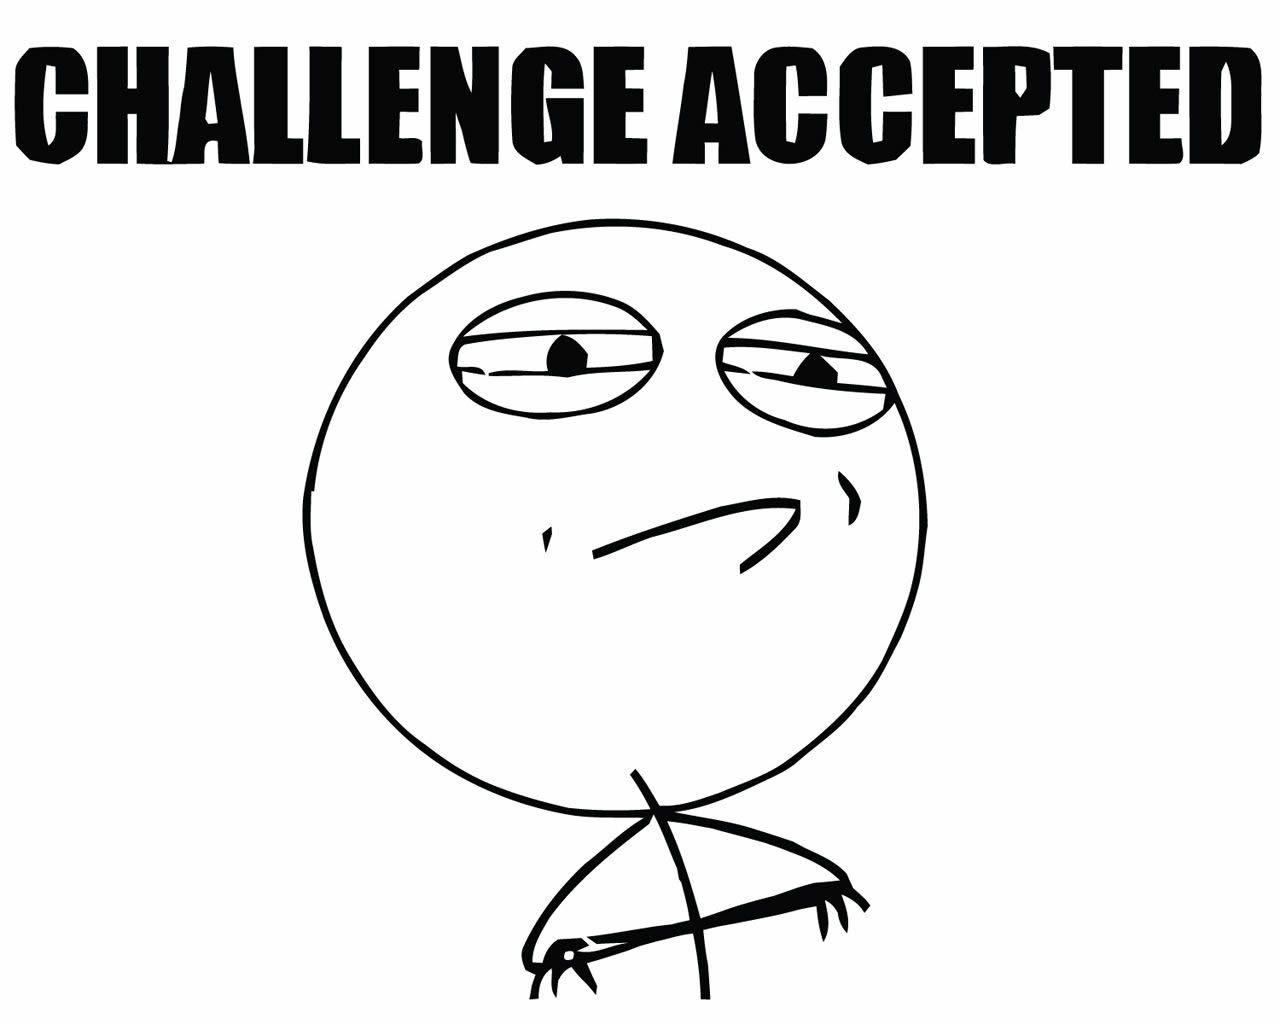 Meme Challenge Accepted wallpaper | Desafio aceito, Memes, Challenge